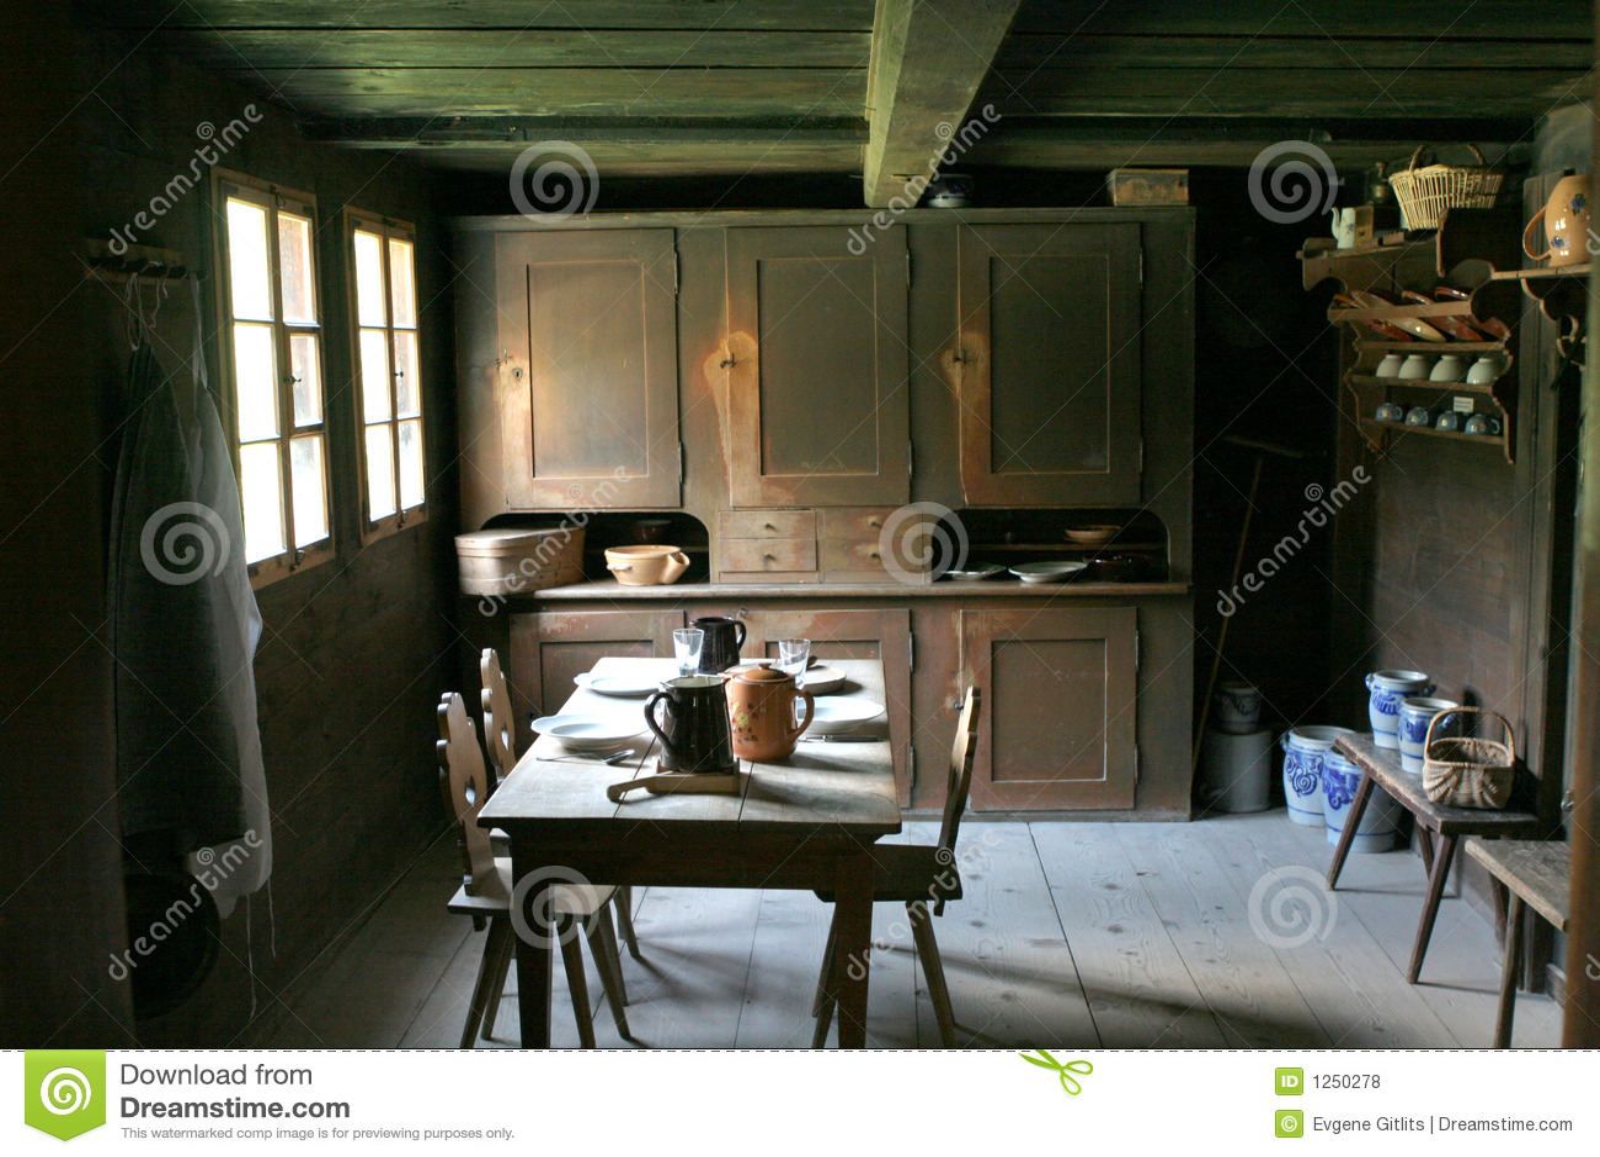 Keuken in de oude stijl royalty vrije stock foto 39 s afbeelding 1250278 - Oude stijl keuken wastafel ...